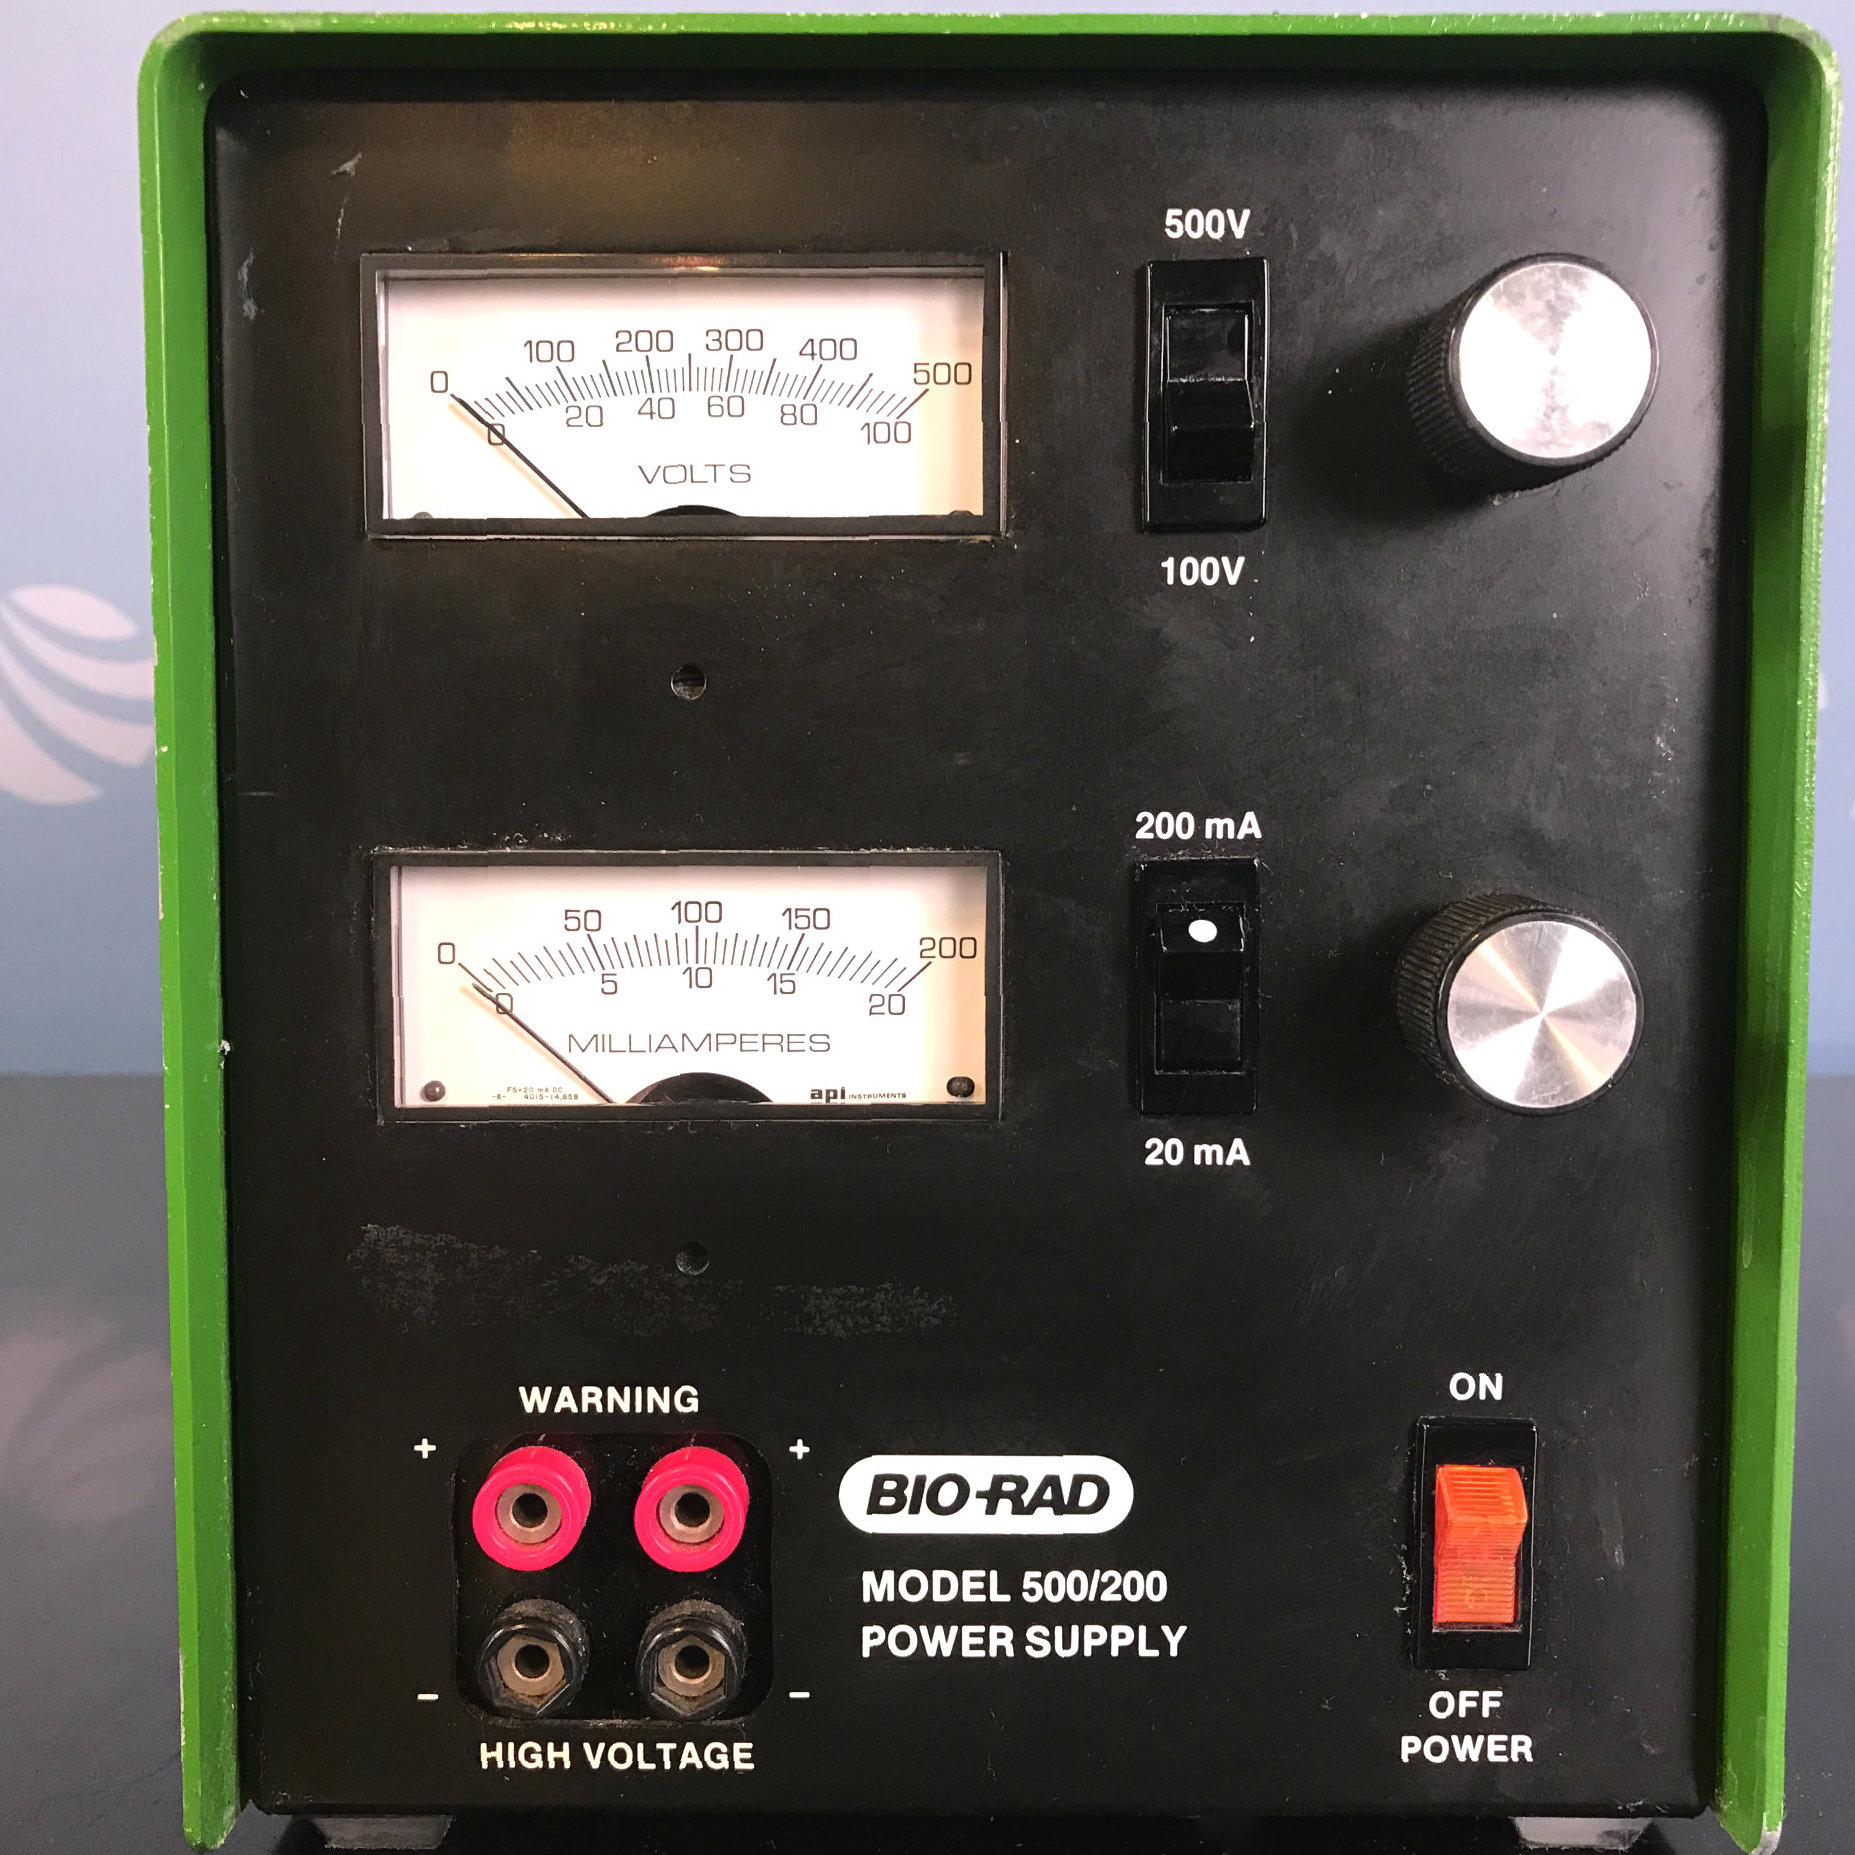 Bio-Rad Model 500/200 Electrophoresis Power Supply Image